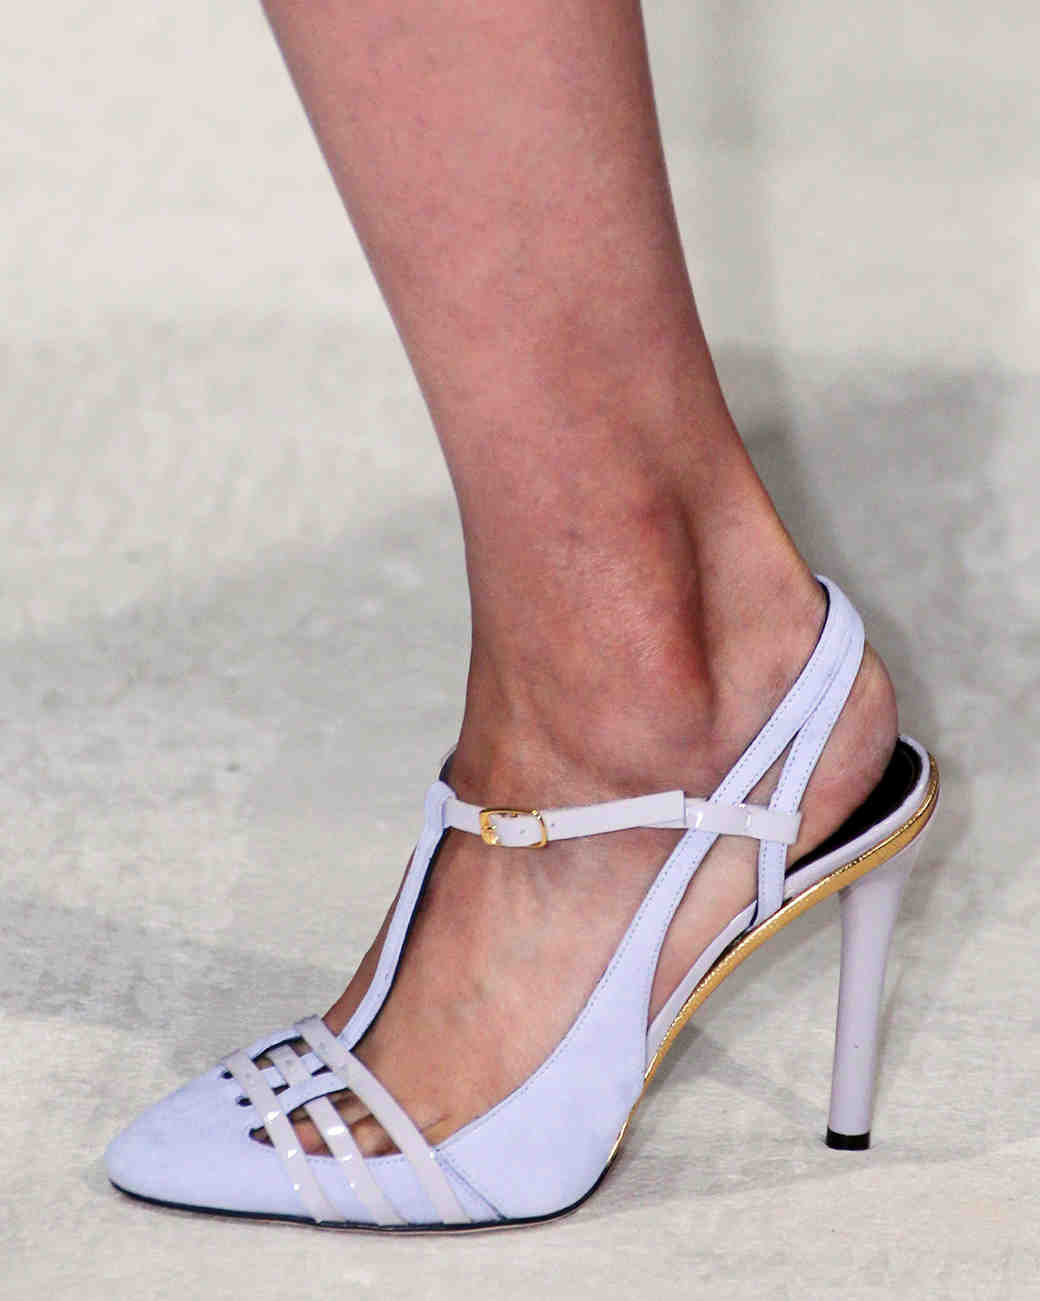 sp16-nyfw-bridal-accessories-oscar-de-la-renta-shoes-0915.jpg